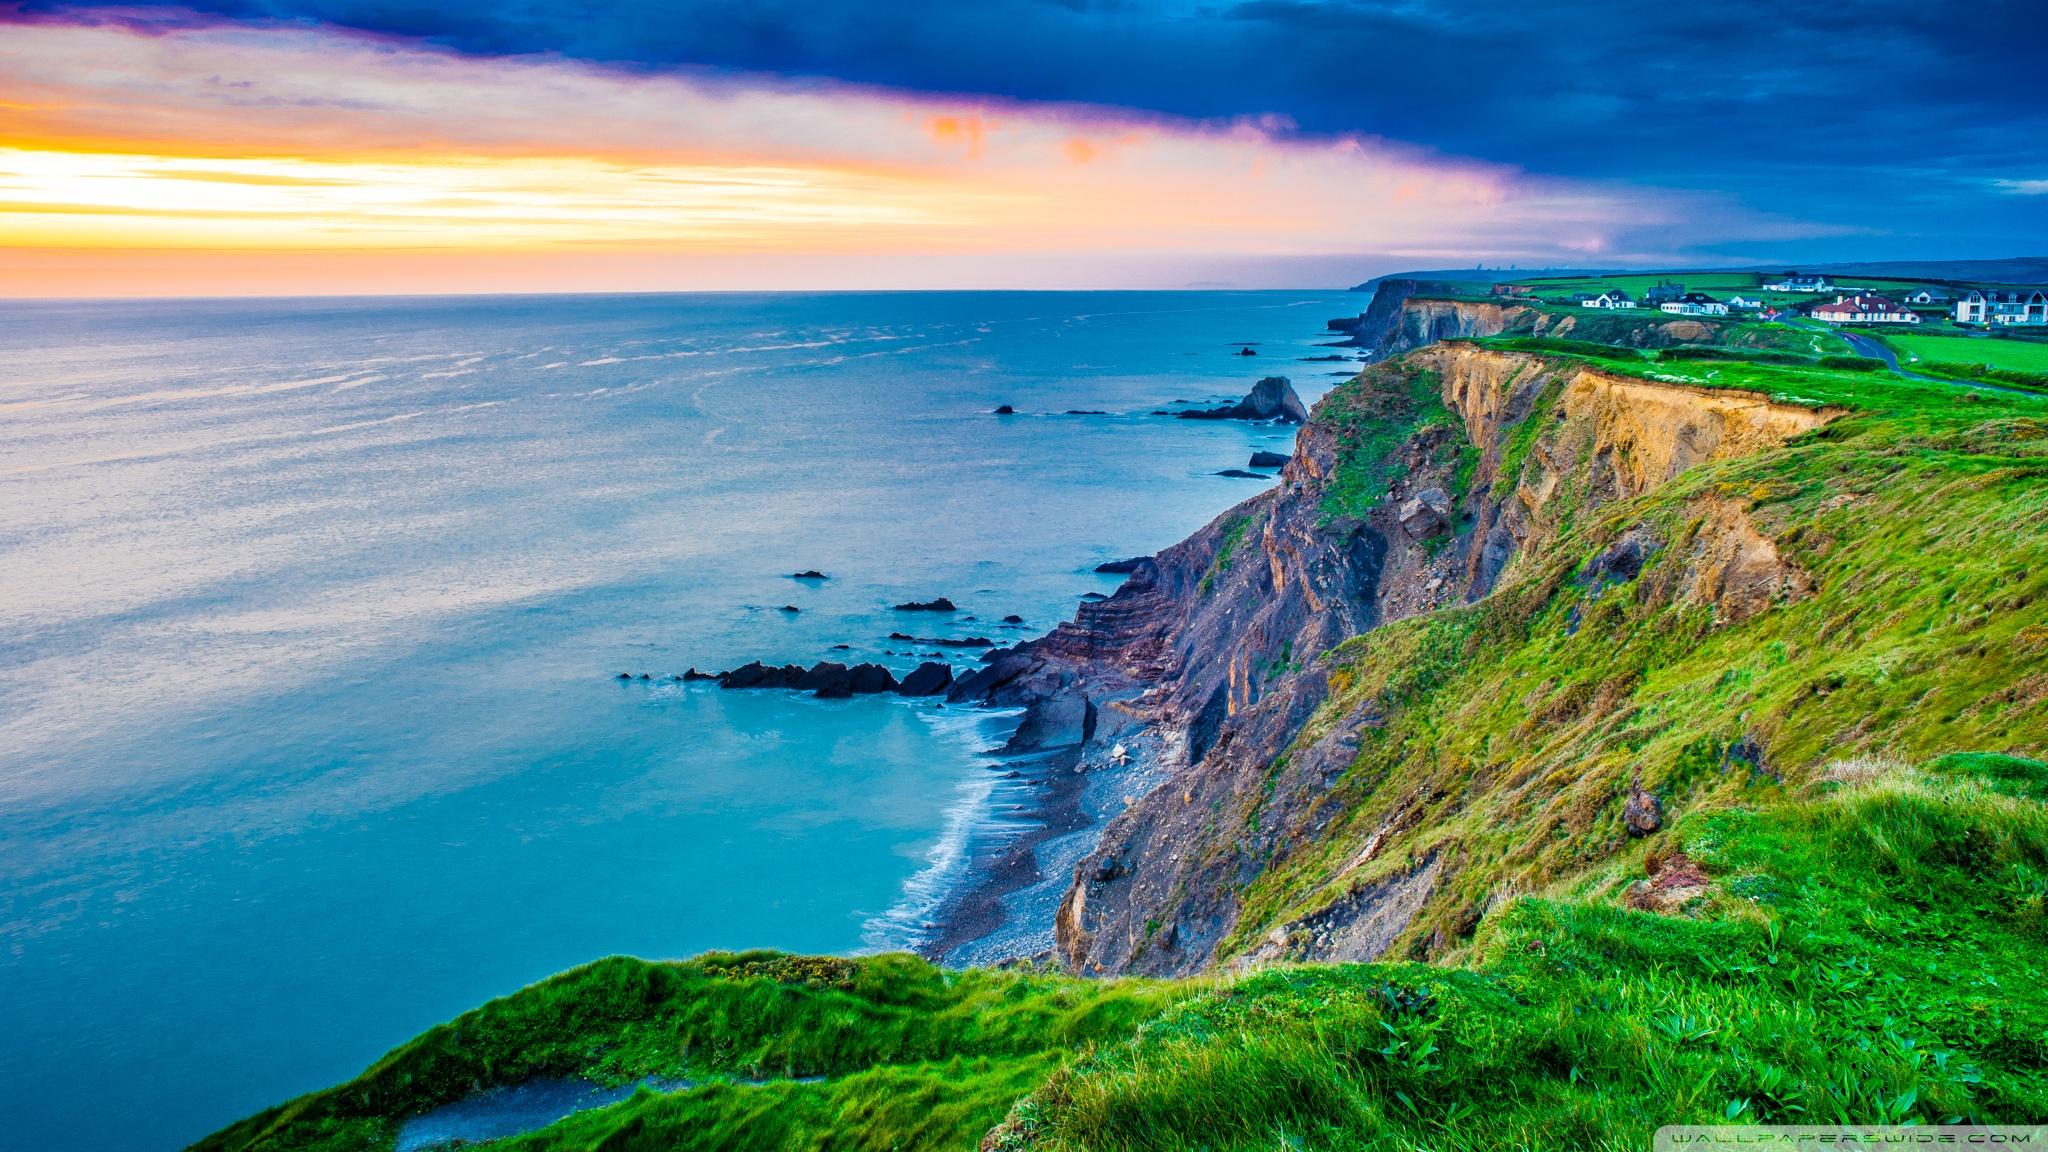 Coast Cornwall England United Kingdom 4K HD Desktop 2048x1152